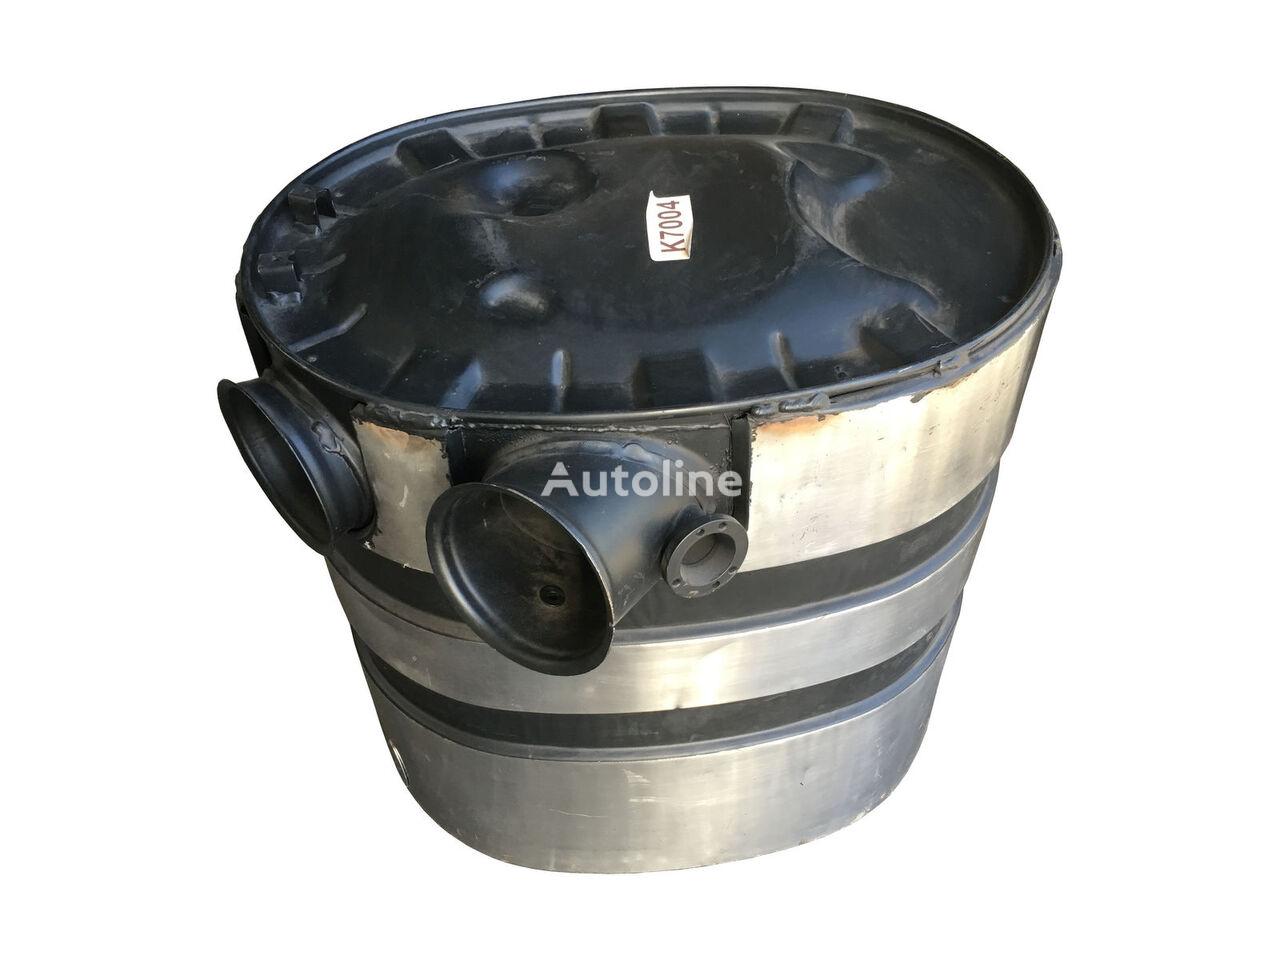 RENAULT Euro 5 (20920707) catalizador para RENAULT Premium, Magnum, Kerax camión